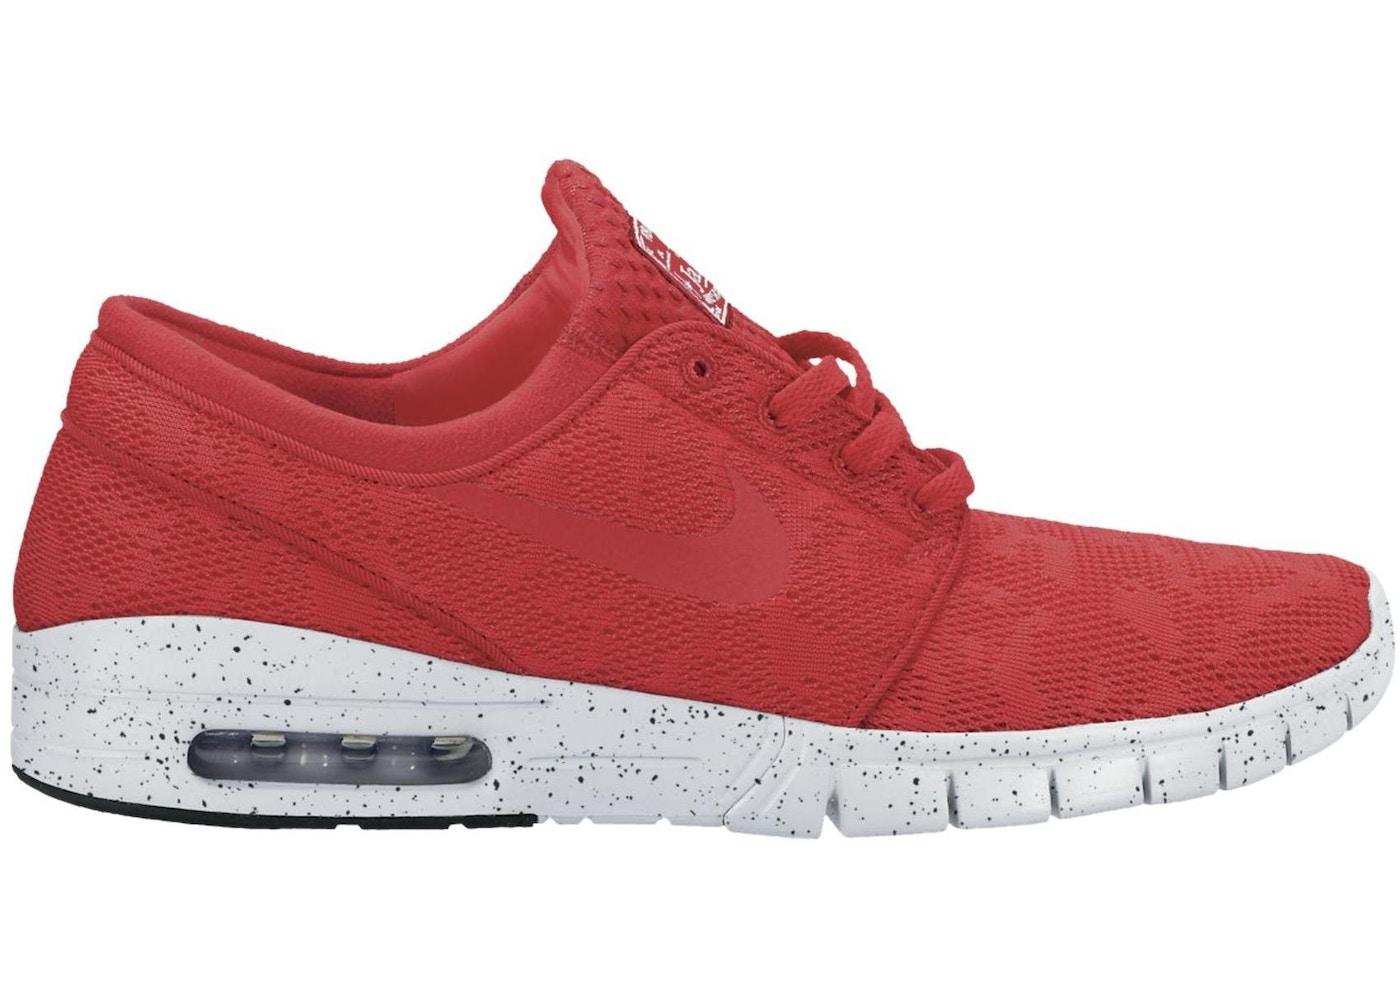 9782cbc1ad Nike SB Stefan Janoski Max Light Crimson - 631303-661